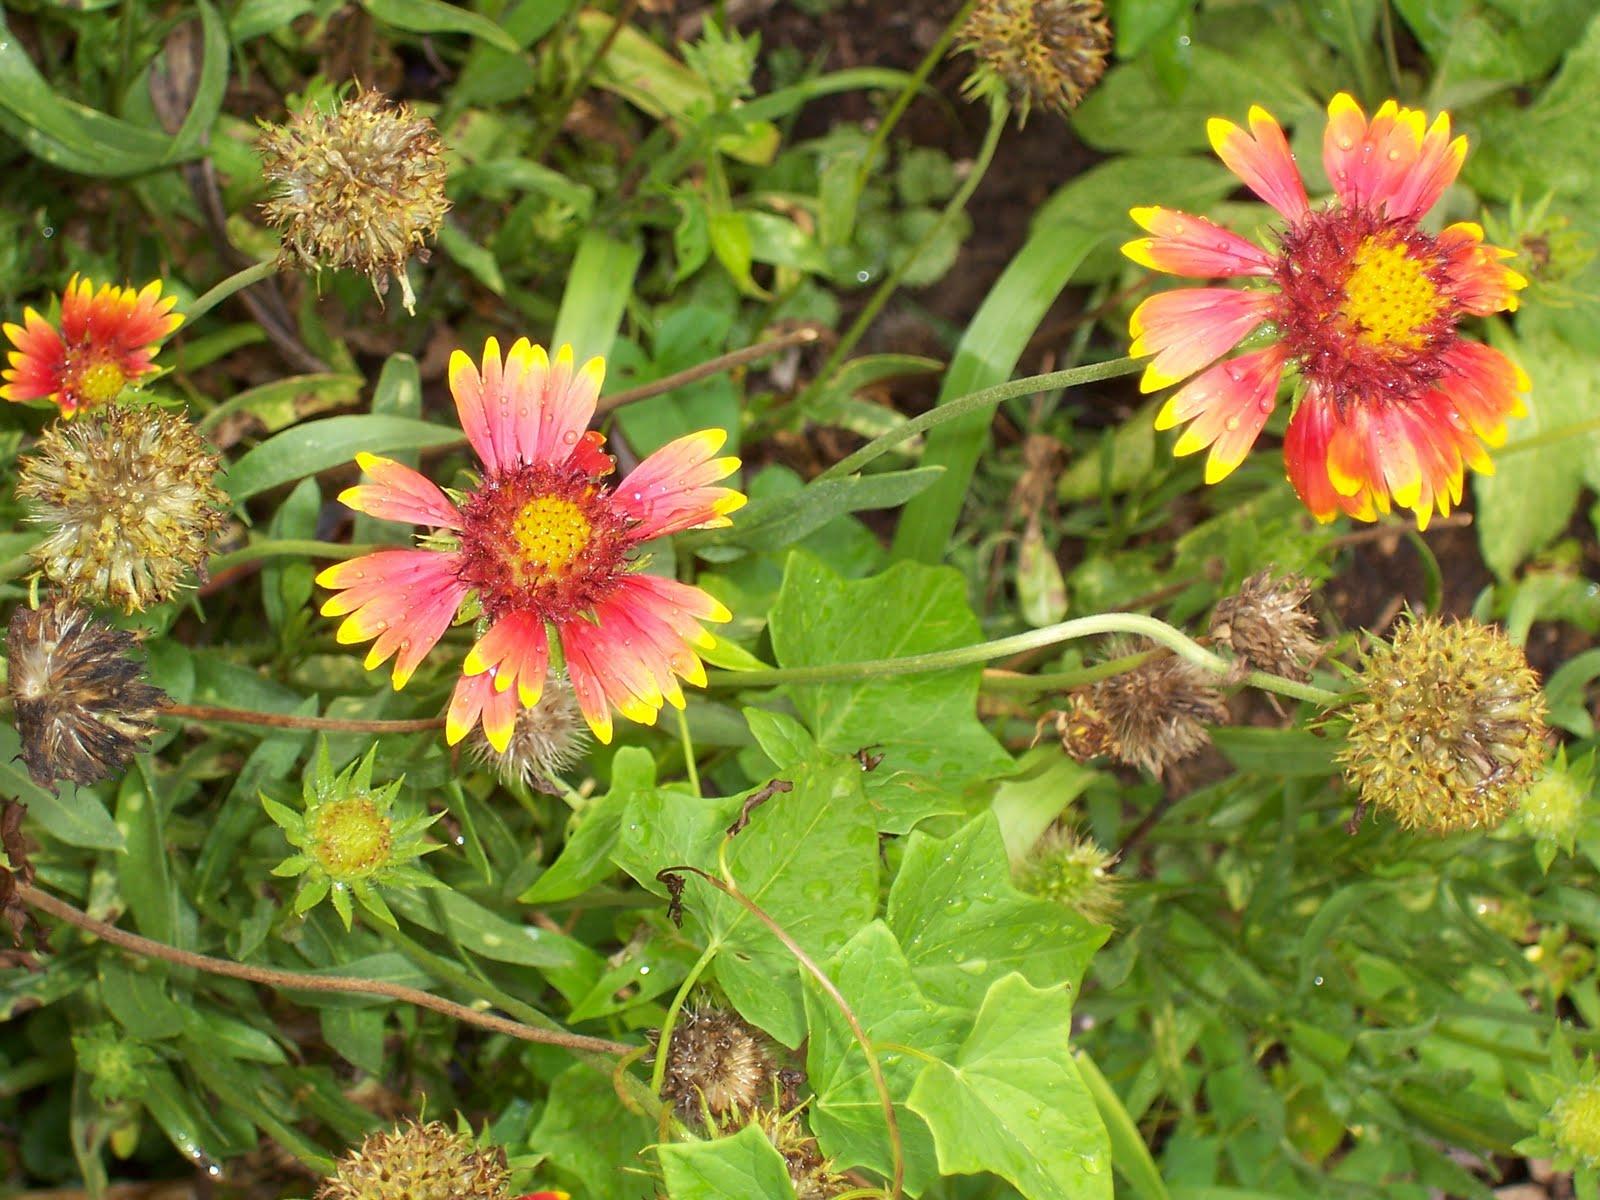 Garden Beauty Gaillardia or Blanket flower or goblin daisy